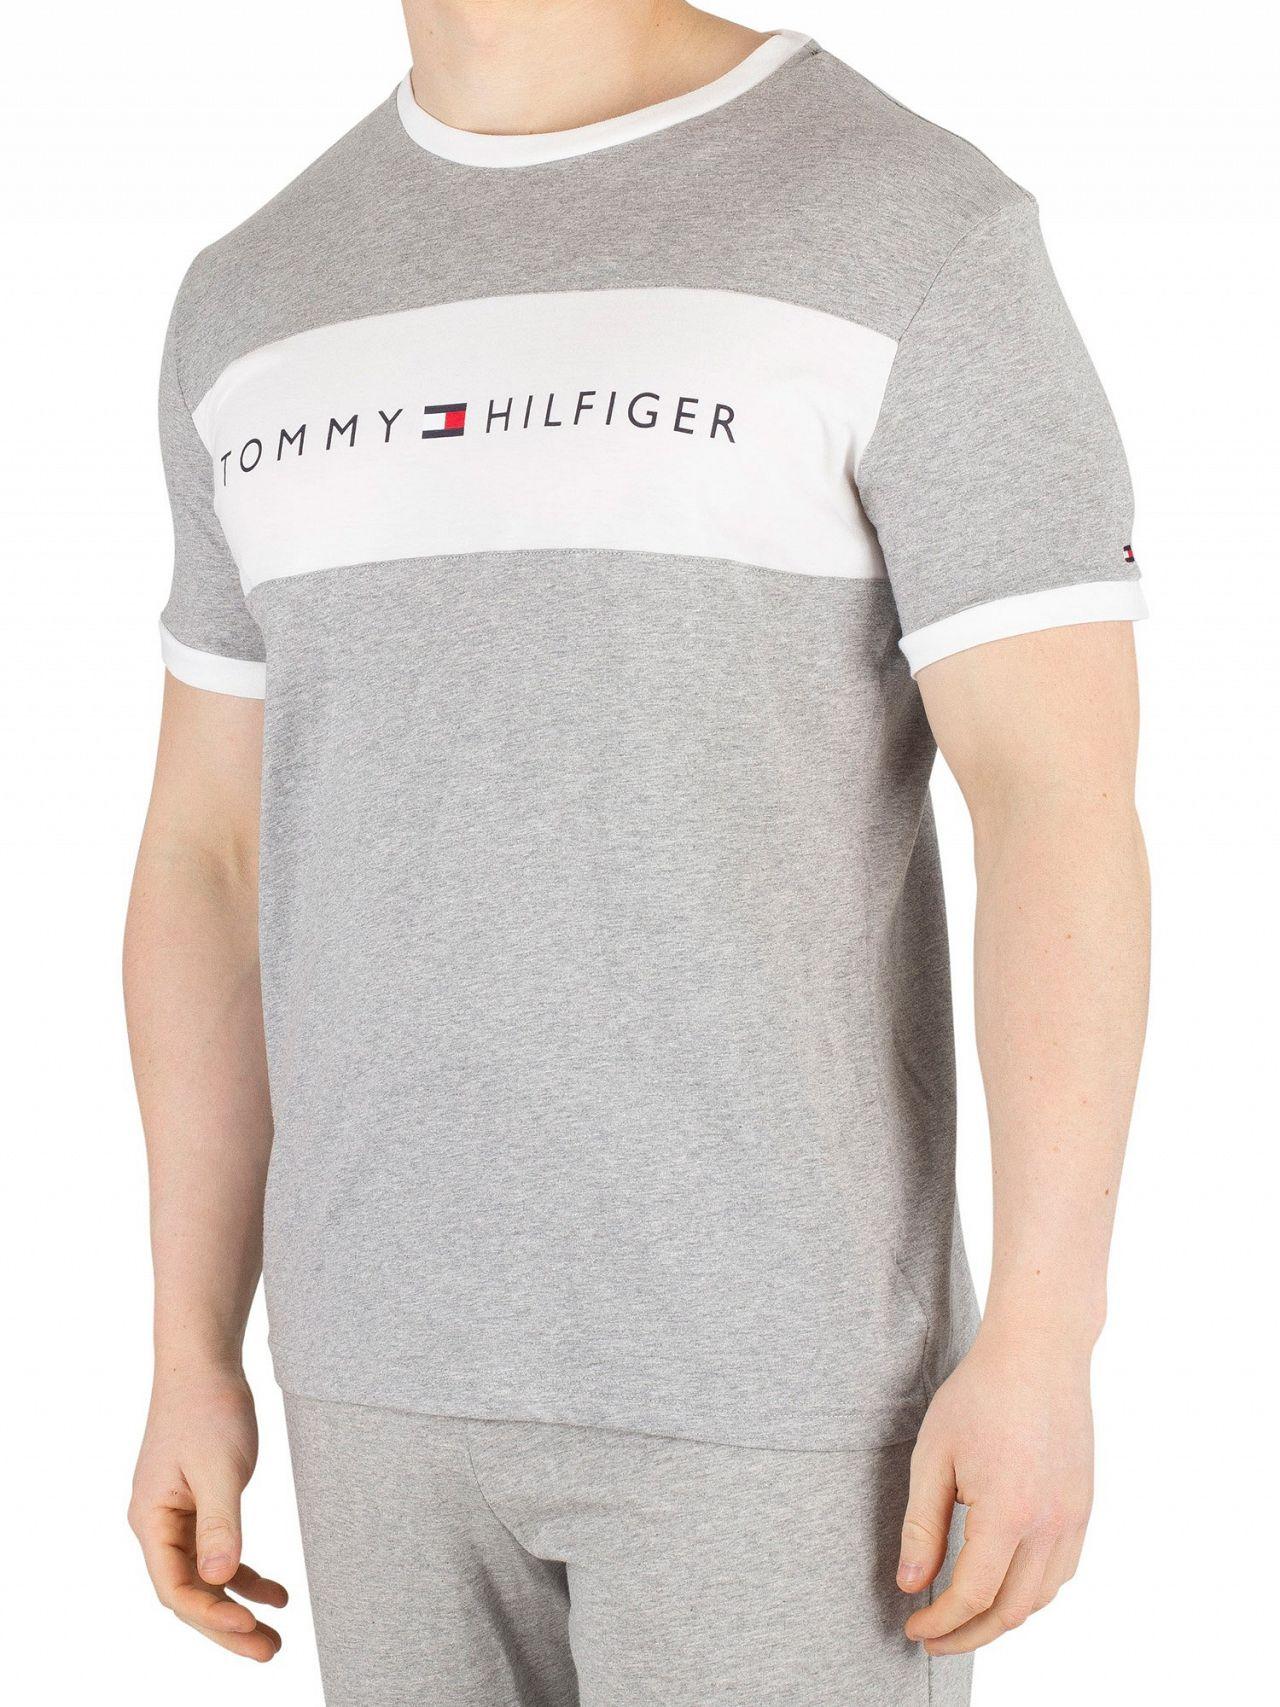 bcd53099 Tommy Hilfiger Grey Heather Flag Logo T-Shirt | Standout